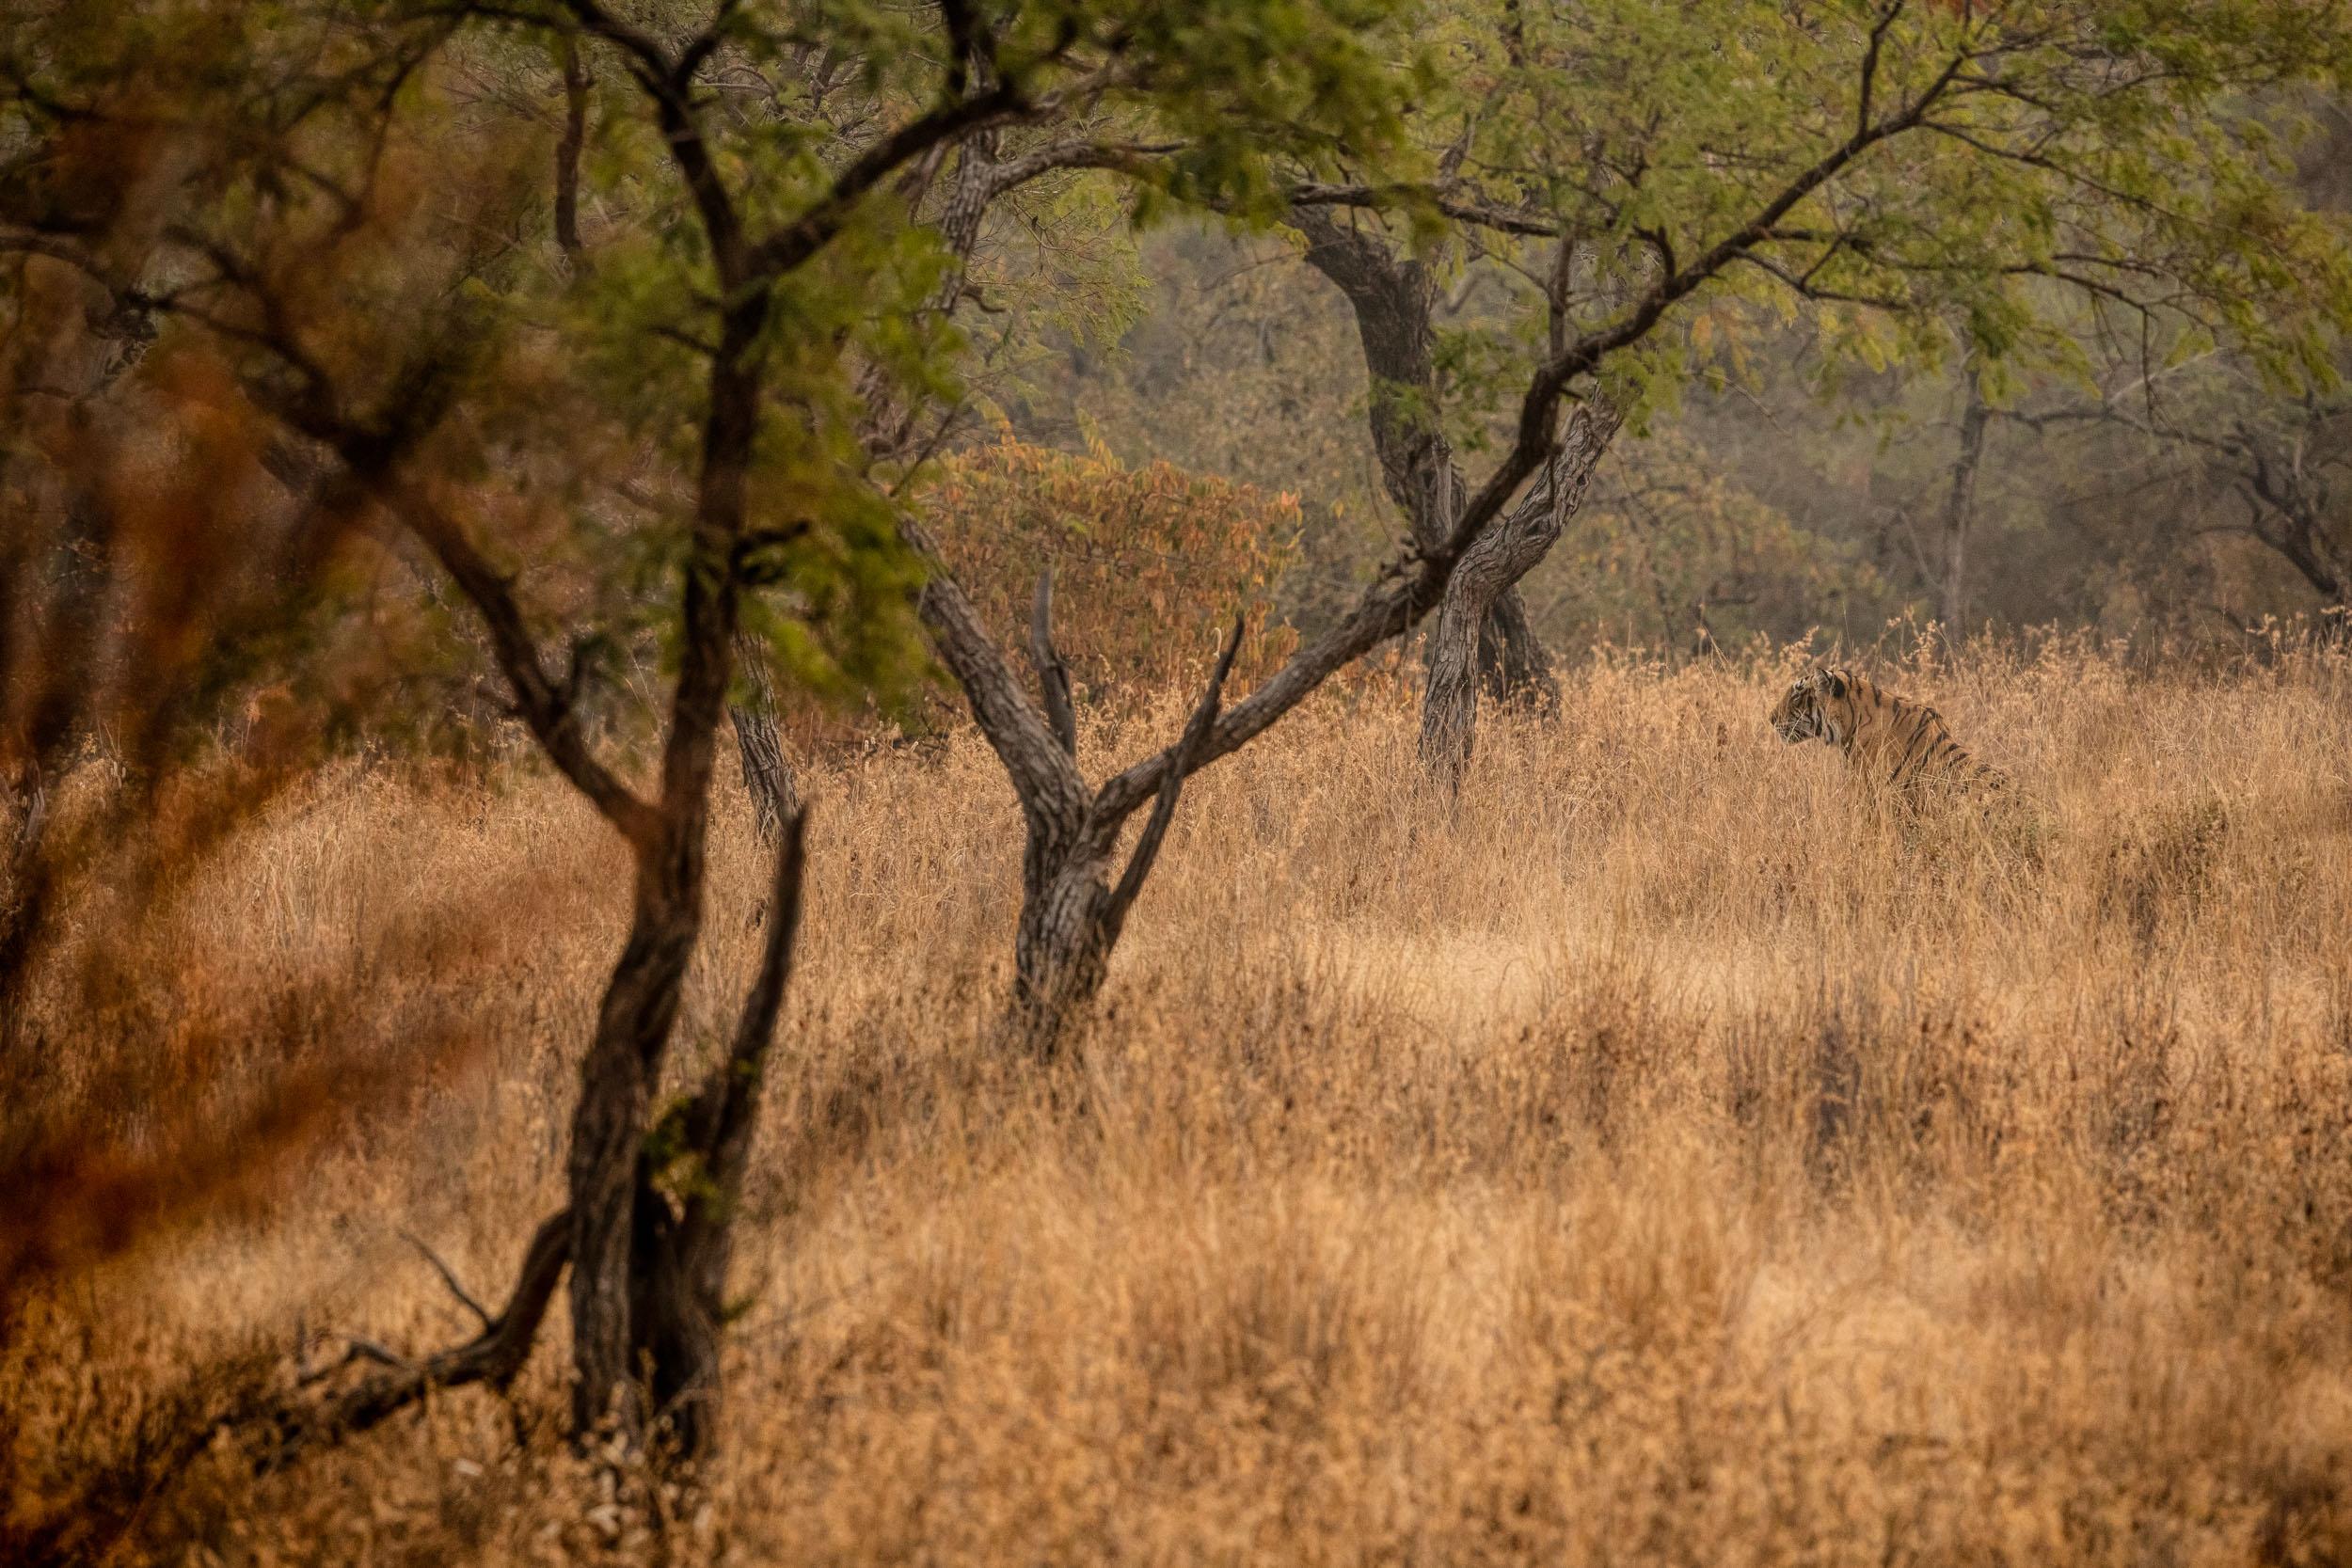 yorkshire_wildlife_photographer-13.jpg